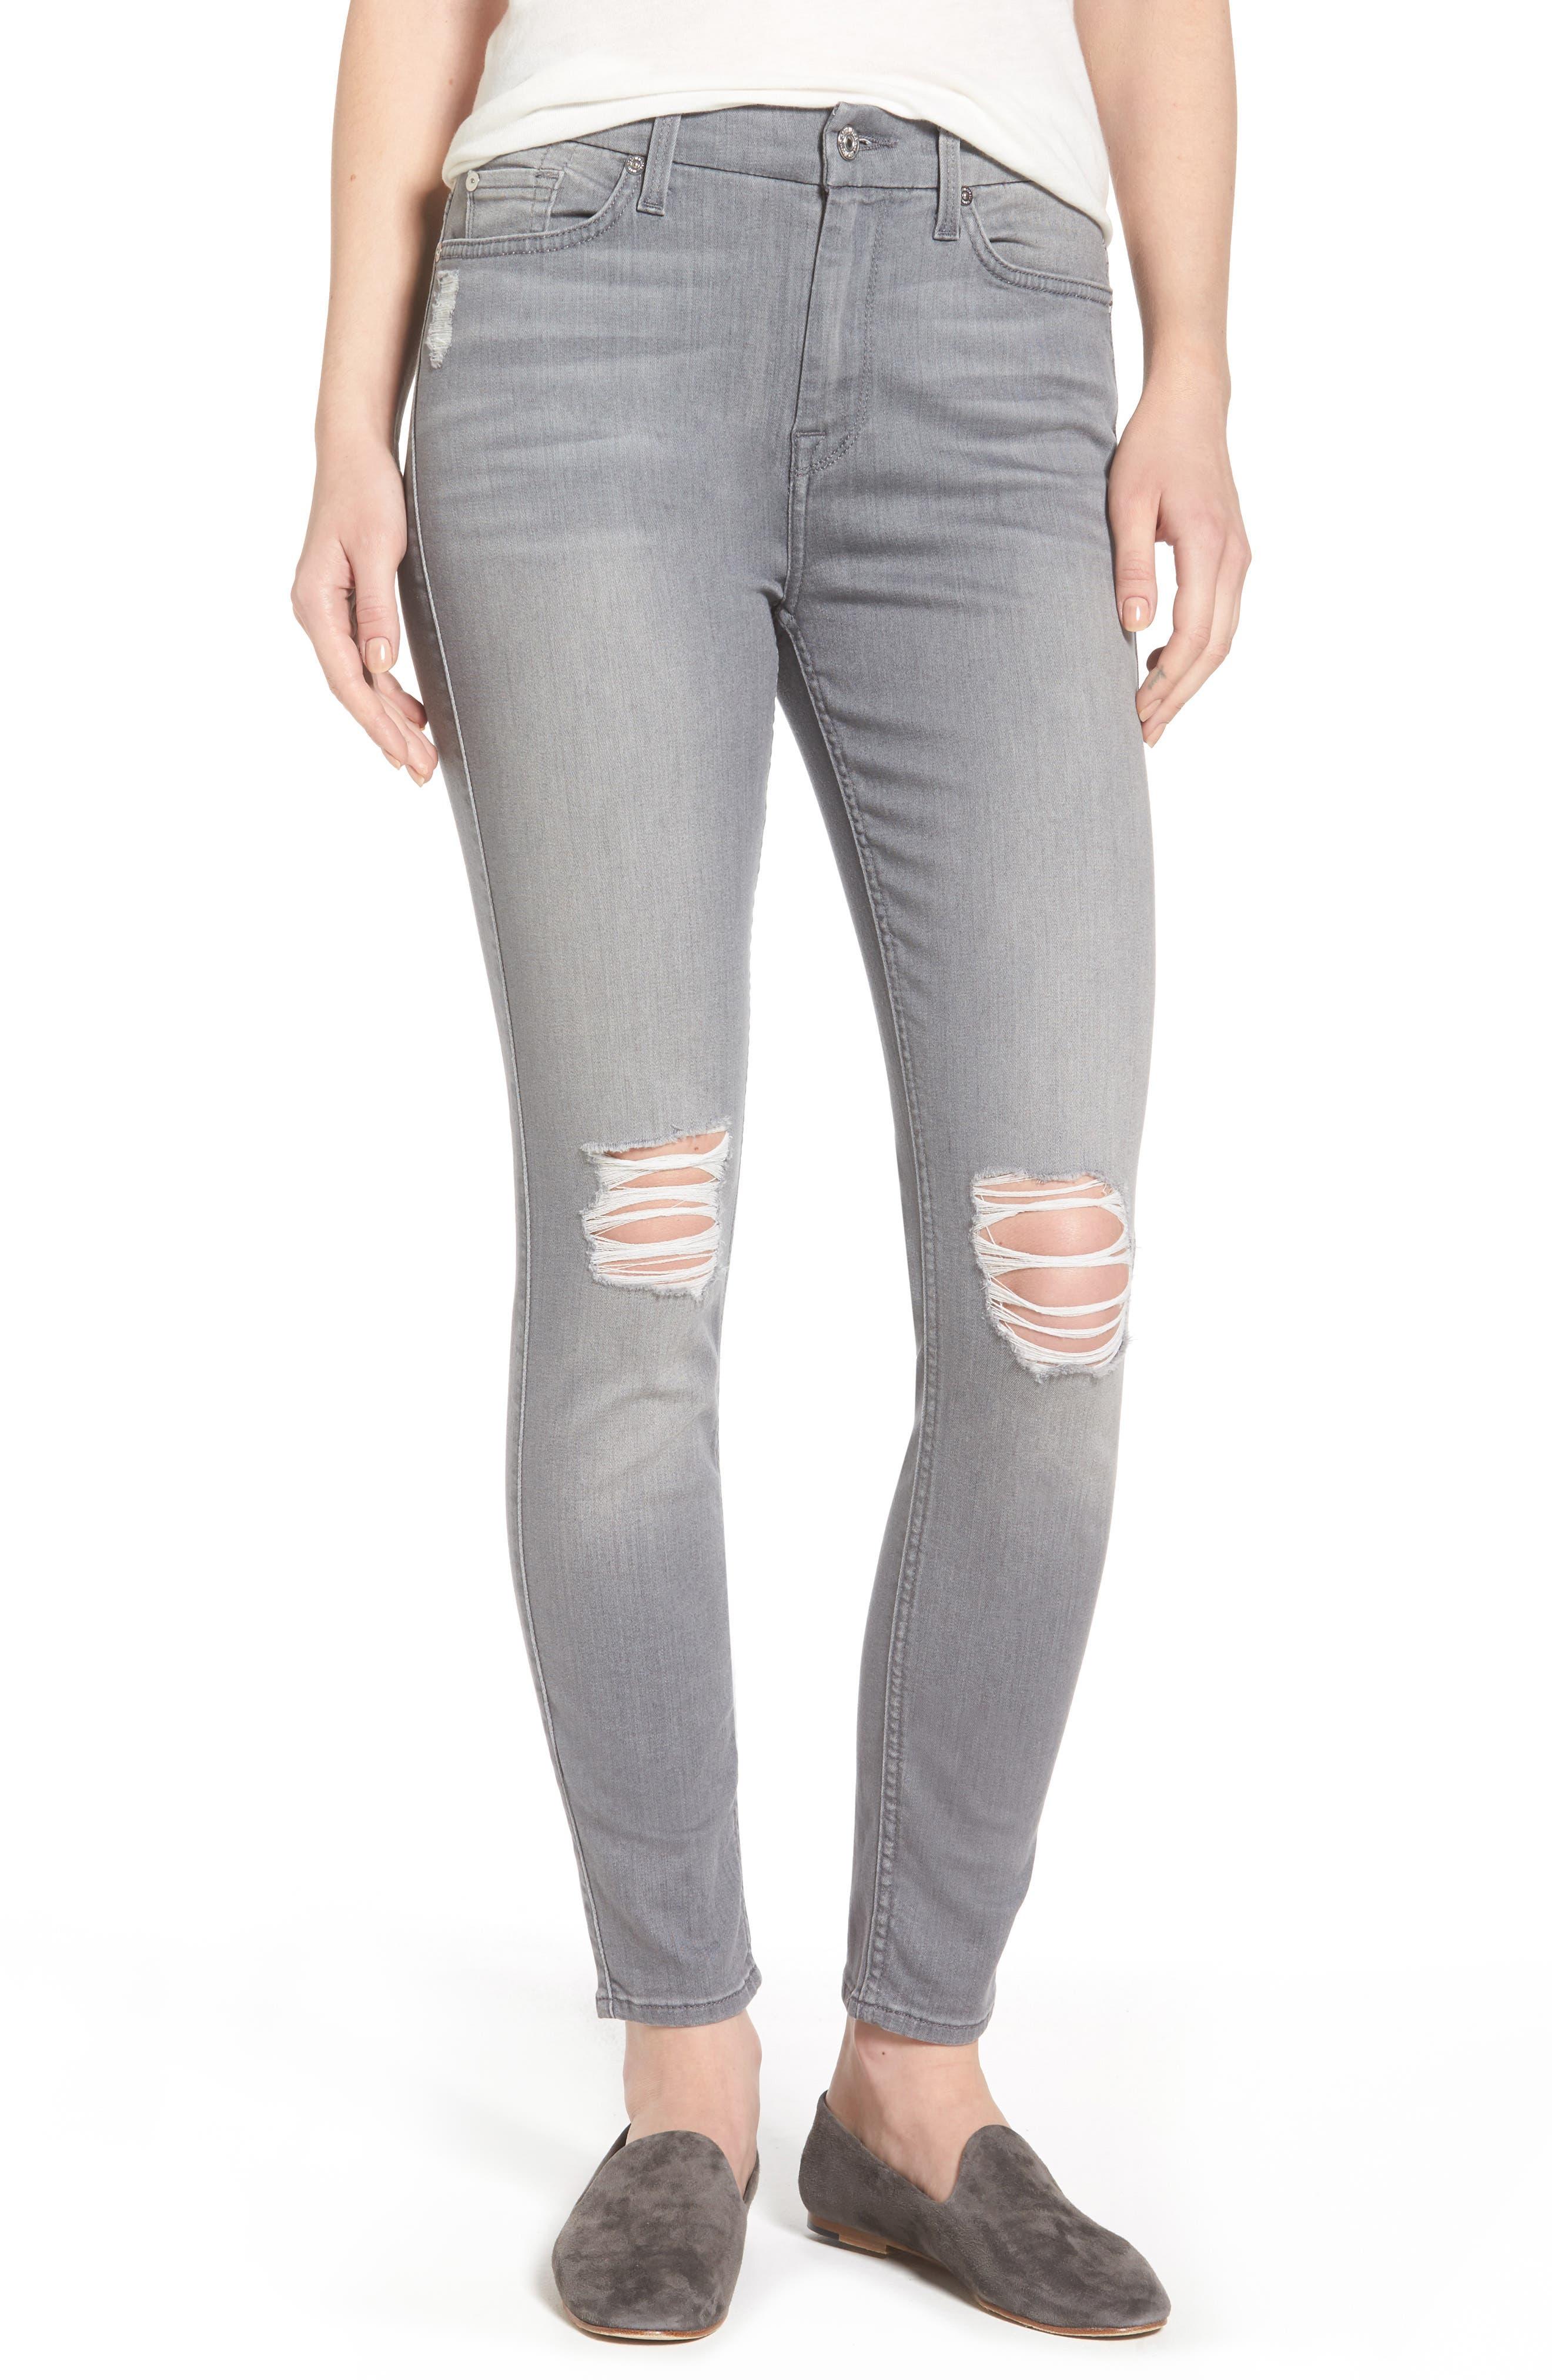 b(air) High Waist Skinny Jeans,                             Main thumbnail 1, color,                             B(Air) Chrysler Grey- Bac2